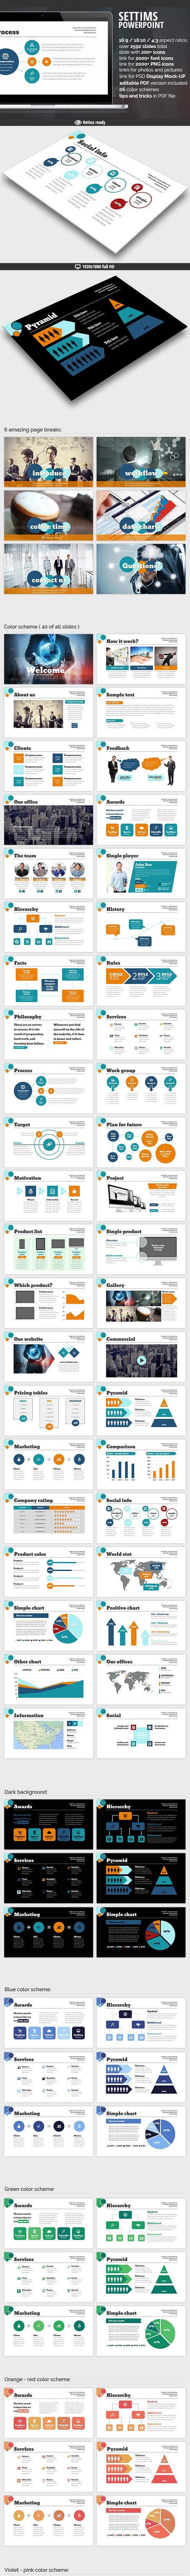 Settims Powerpoint Presentation - Finance PowerPoint Templates